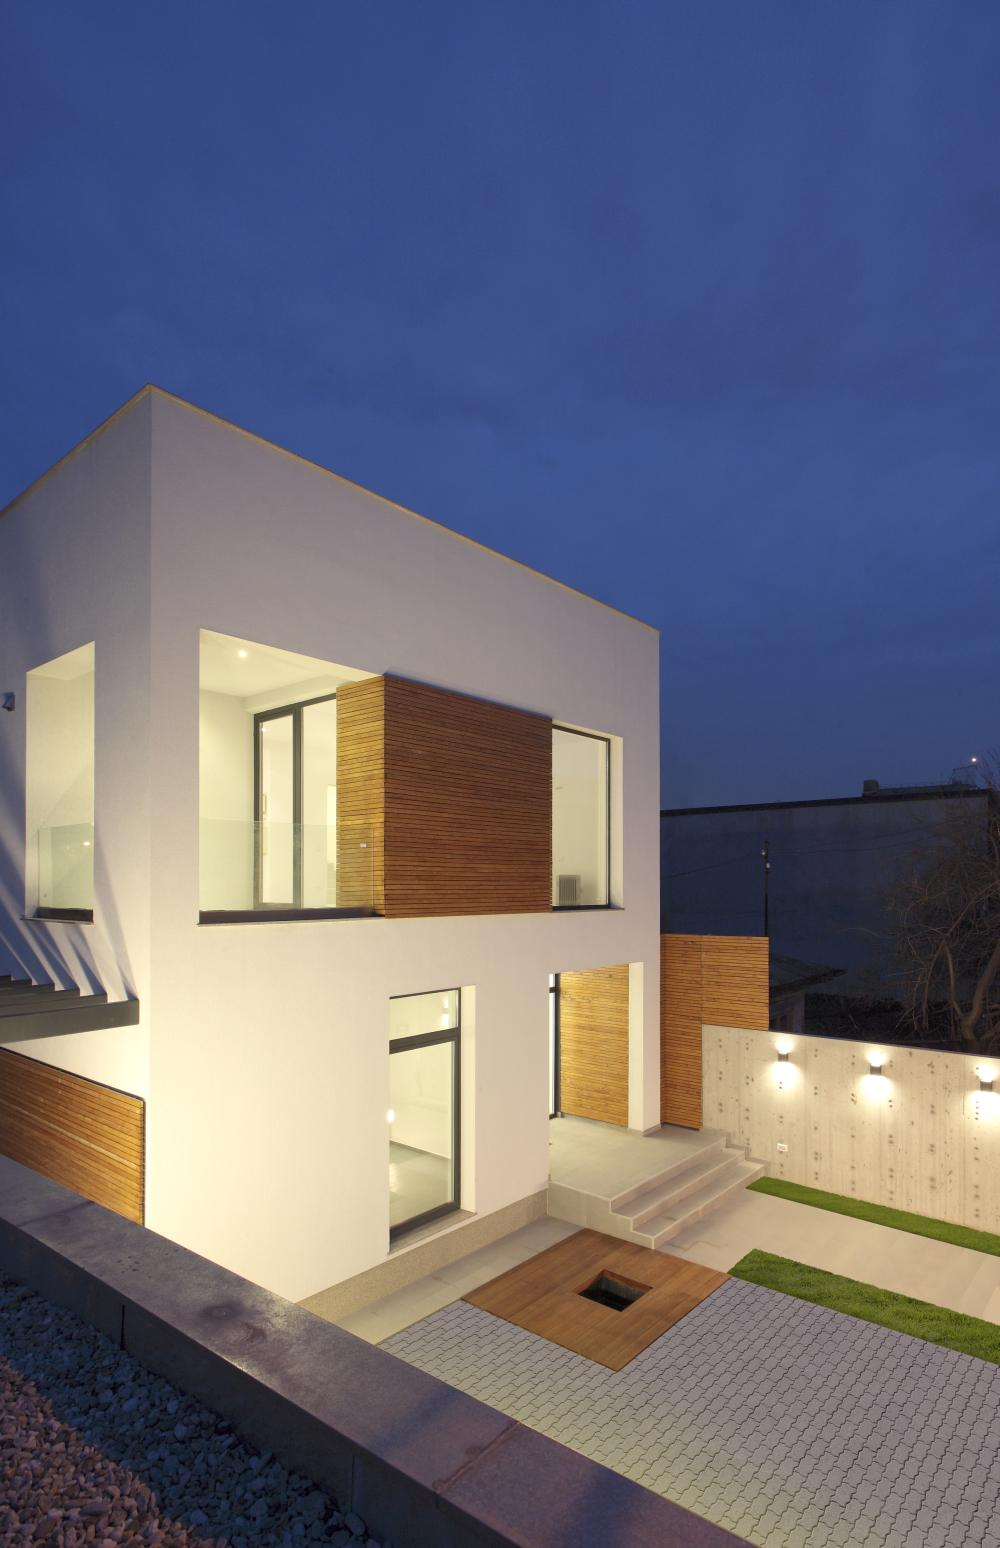 https://nbc-arhitect.ro/wp-content/uploads/2020/11/NBC-ARHITECT-_-residential-_-Mibe-House-_-exterior-view_7.jpg